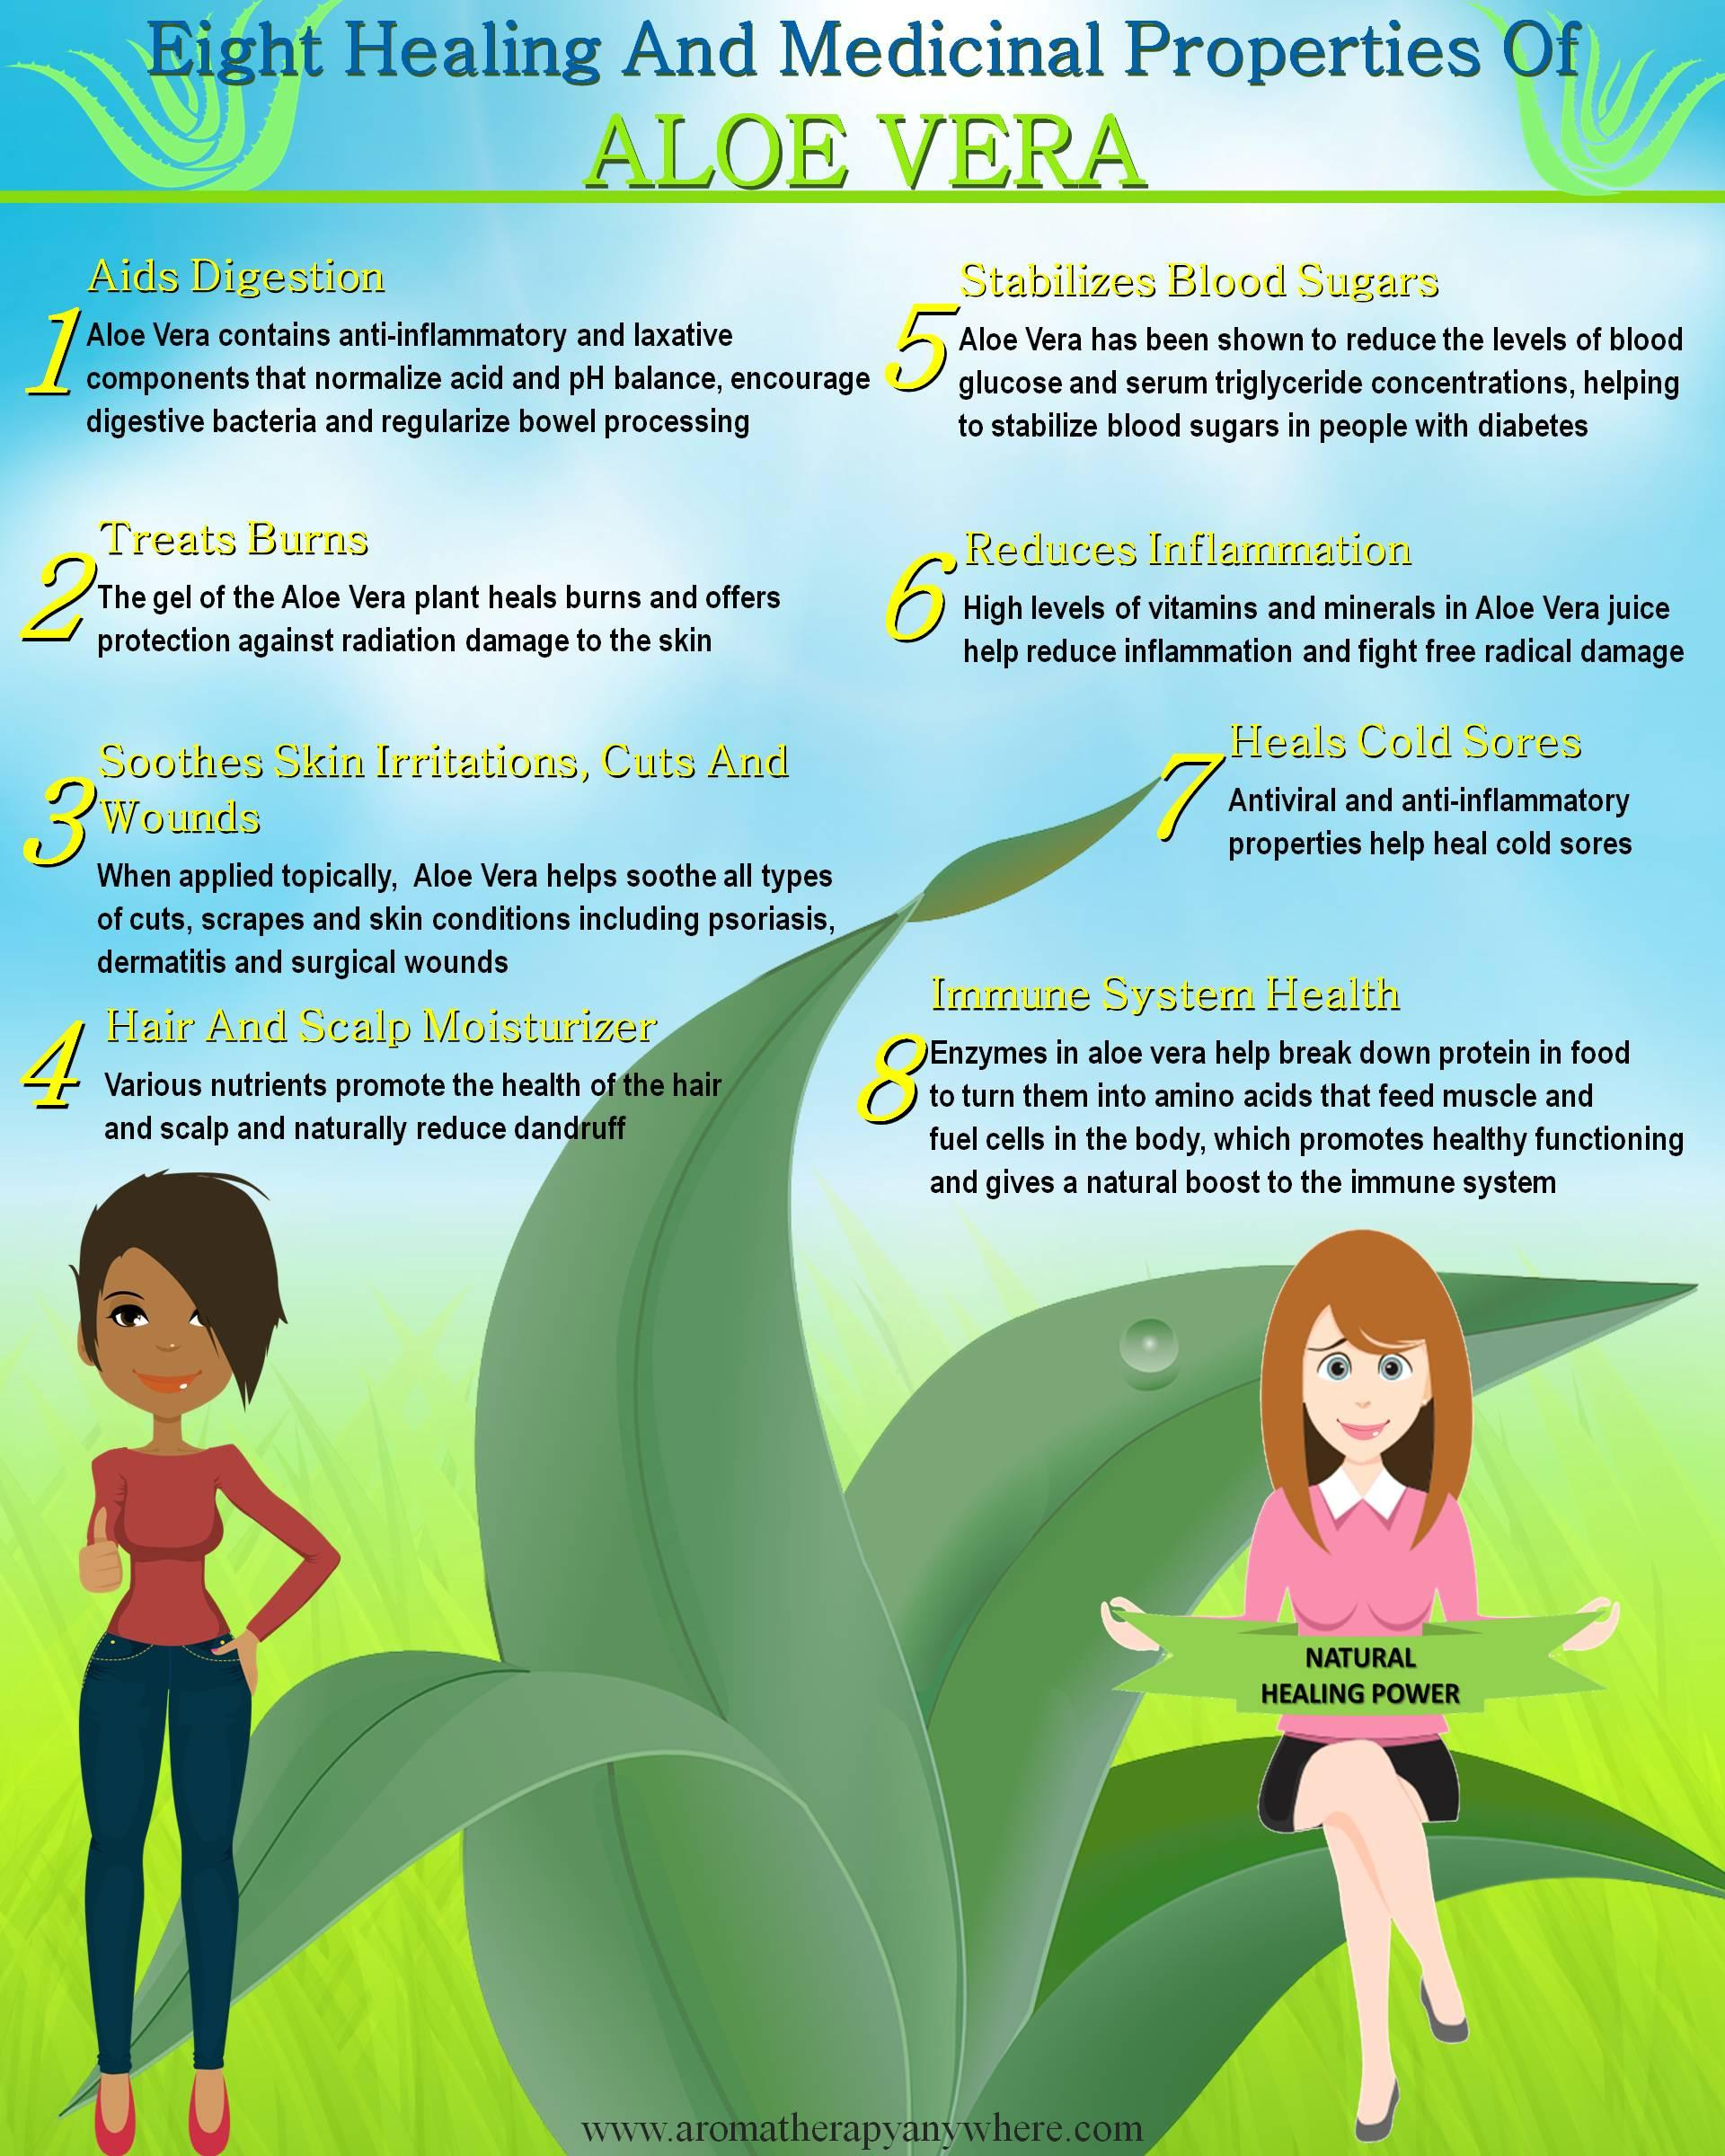 Medicinal & healing properties of Aloe Vera